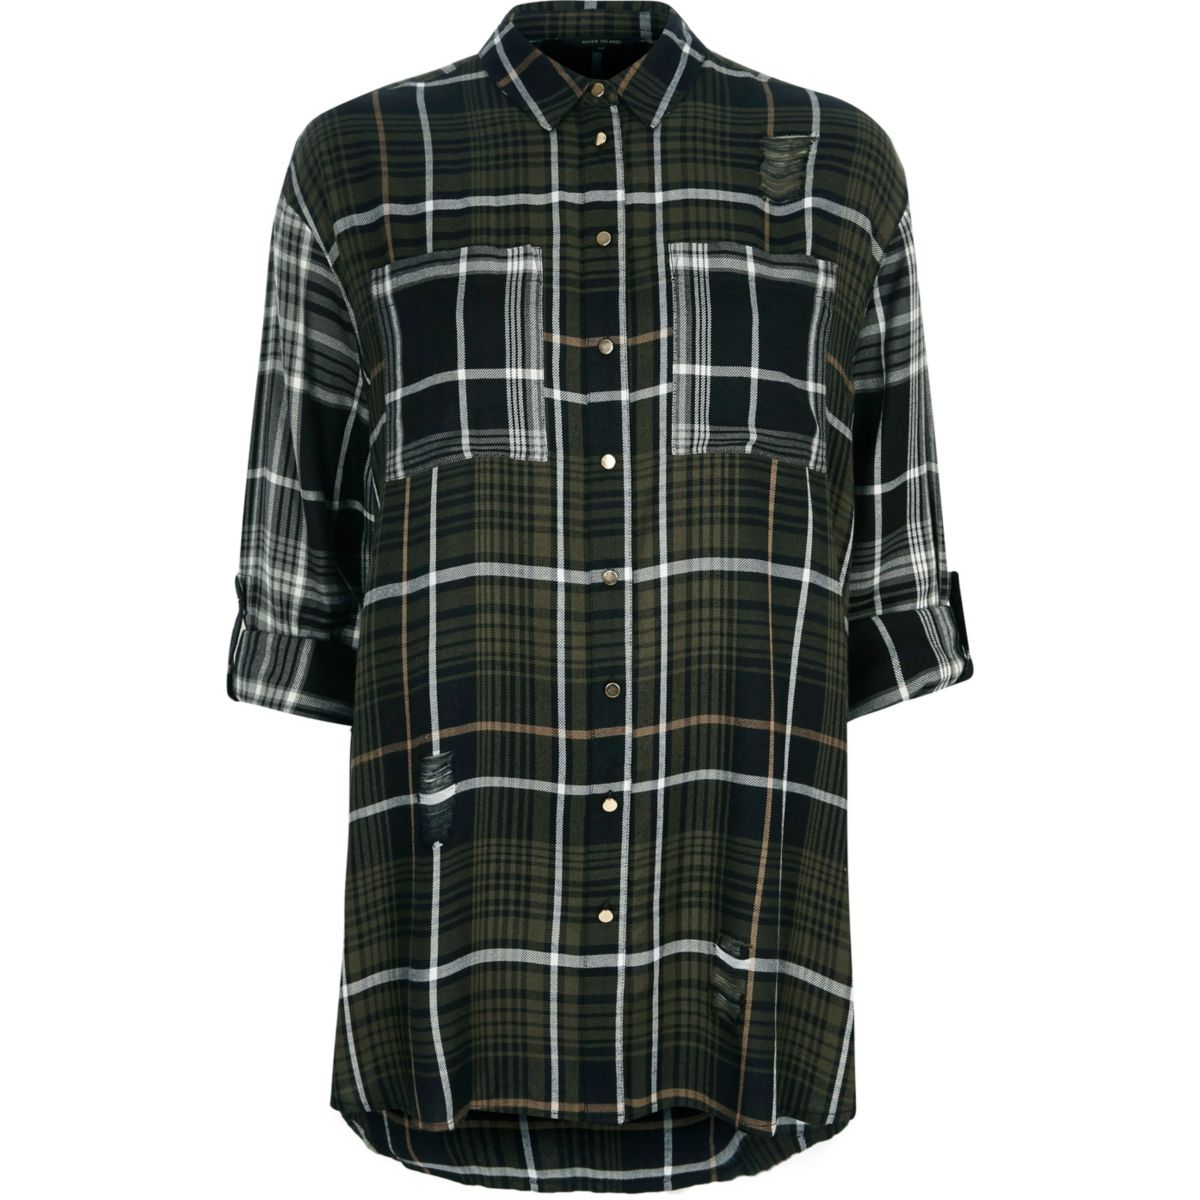 Khaki green check oversized shirt